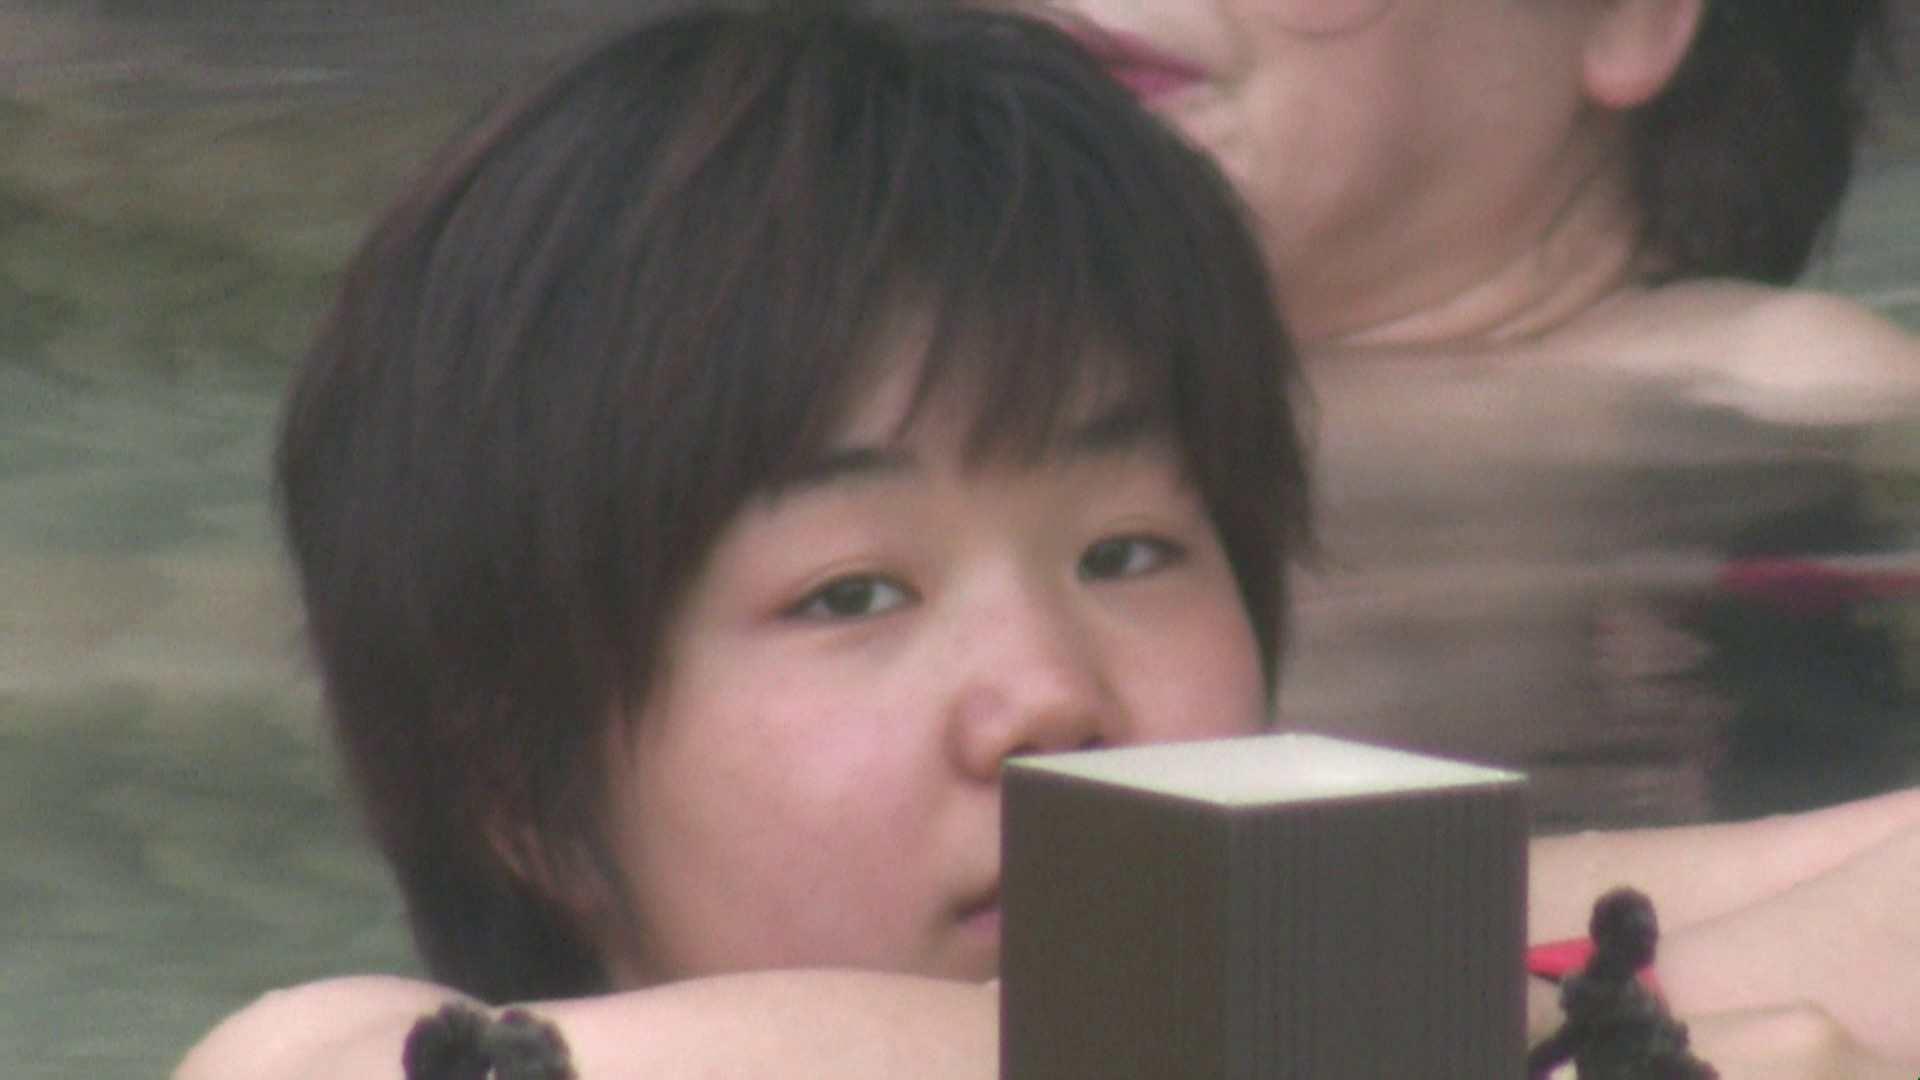 Aquaな露天風呂Vol.53【VIP限定】 女体盗撮 | OL女体  93連発 31